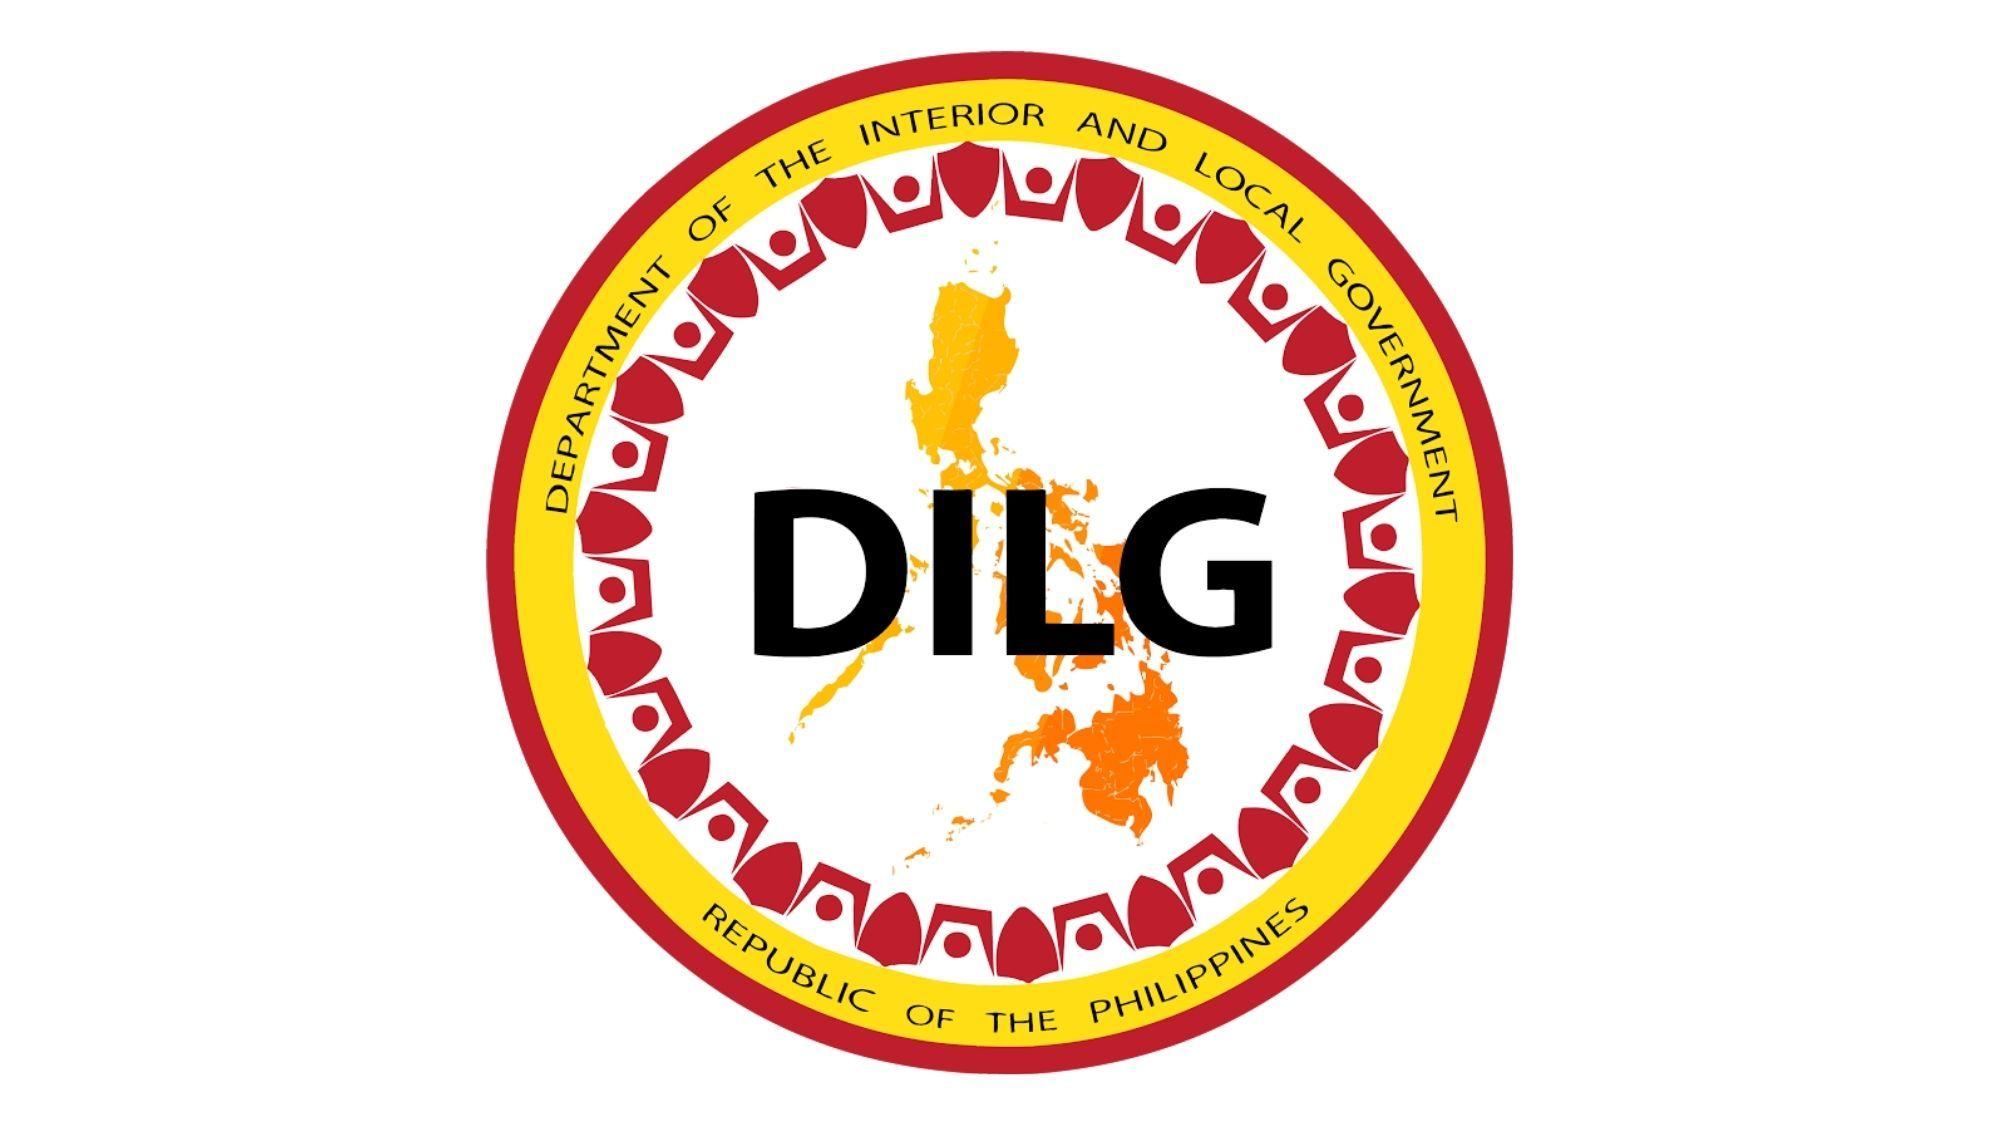 Gearing up for full devolution; DILG prepares LGUs through workshops photo from DILG Philippines